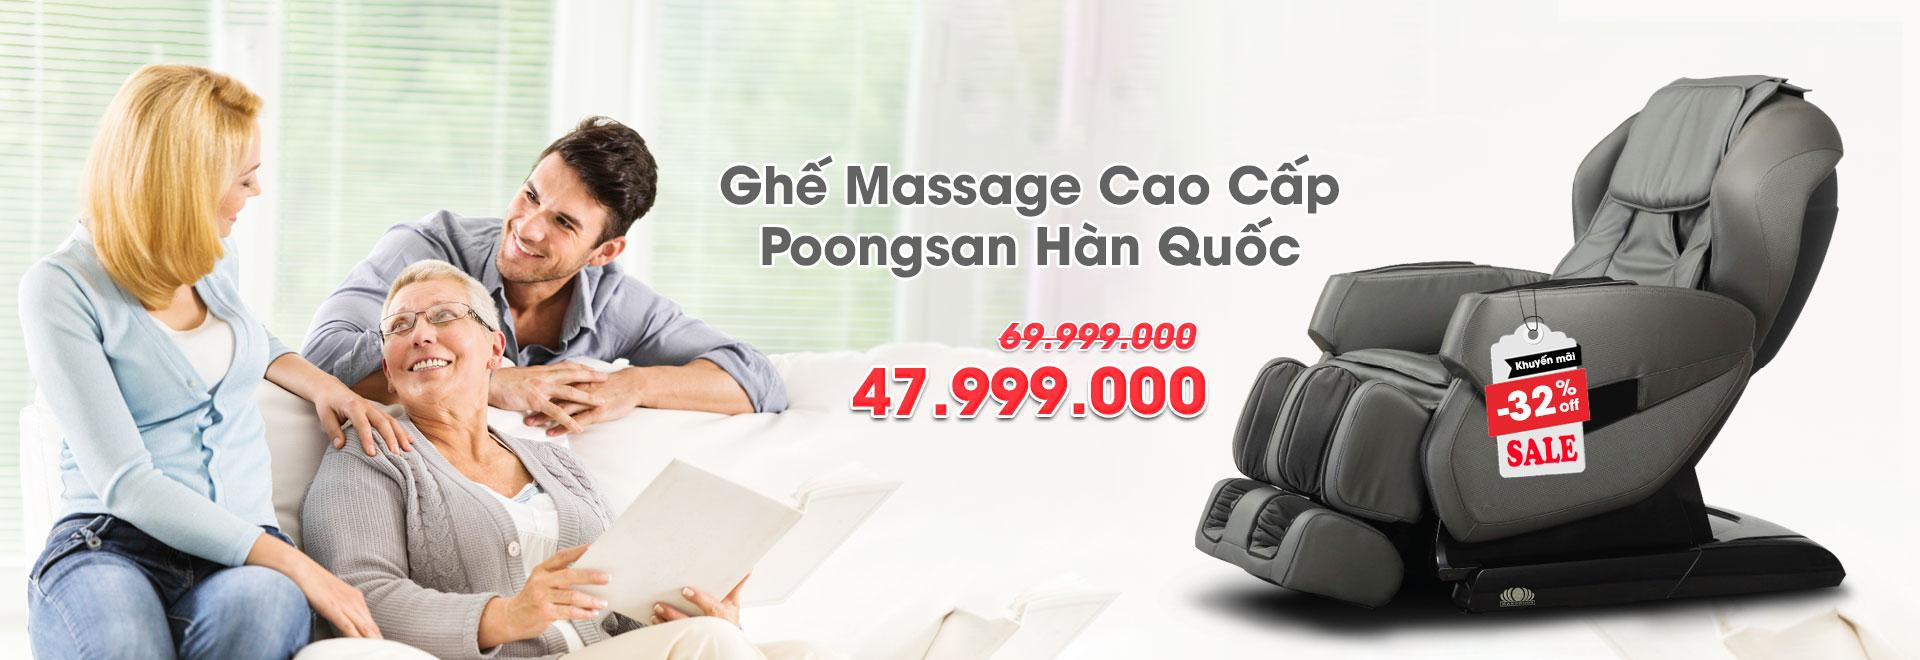 Ghế Massage Poongsan